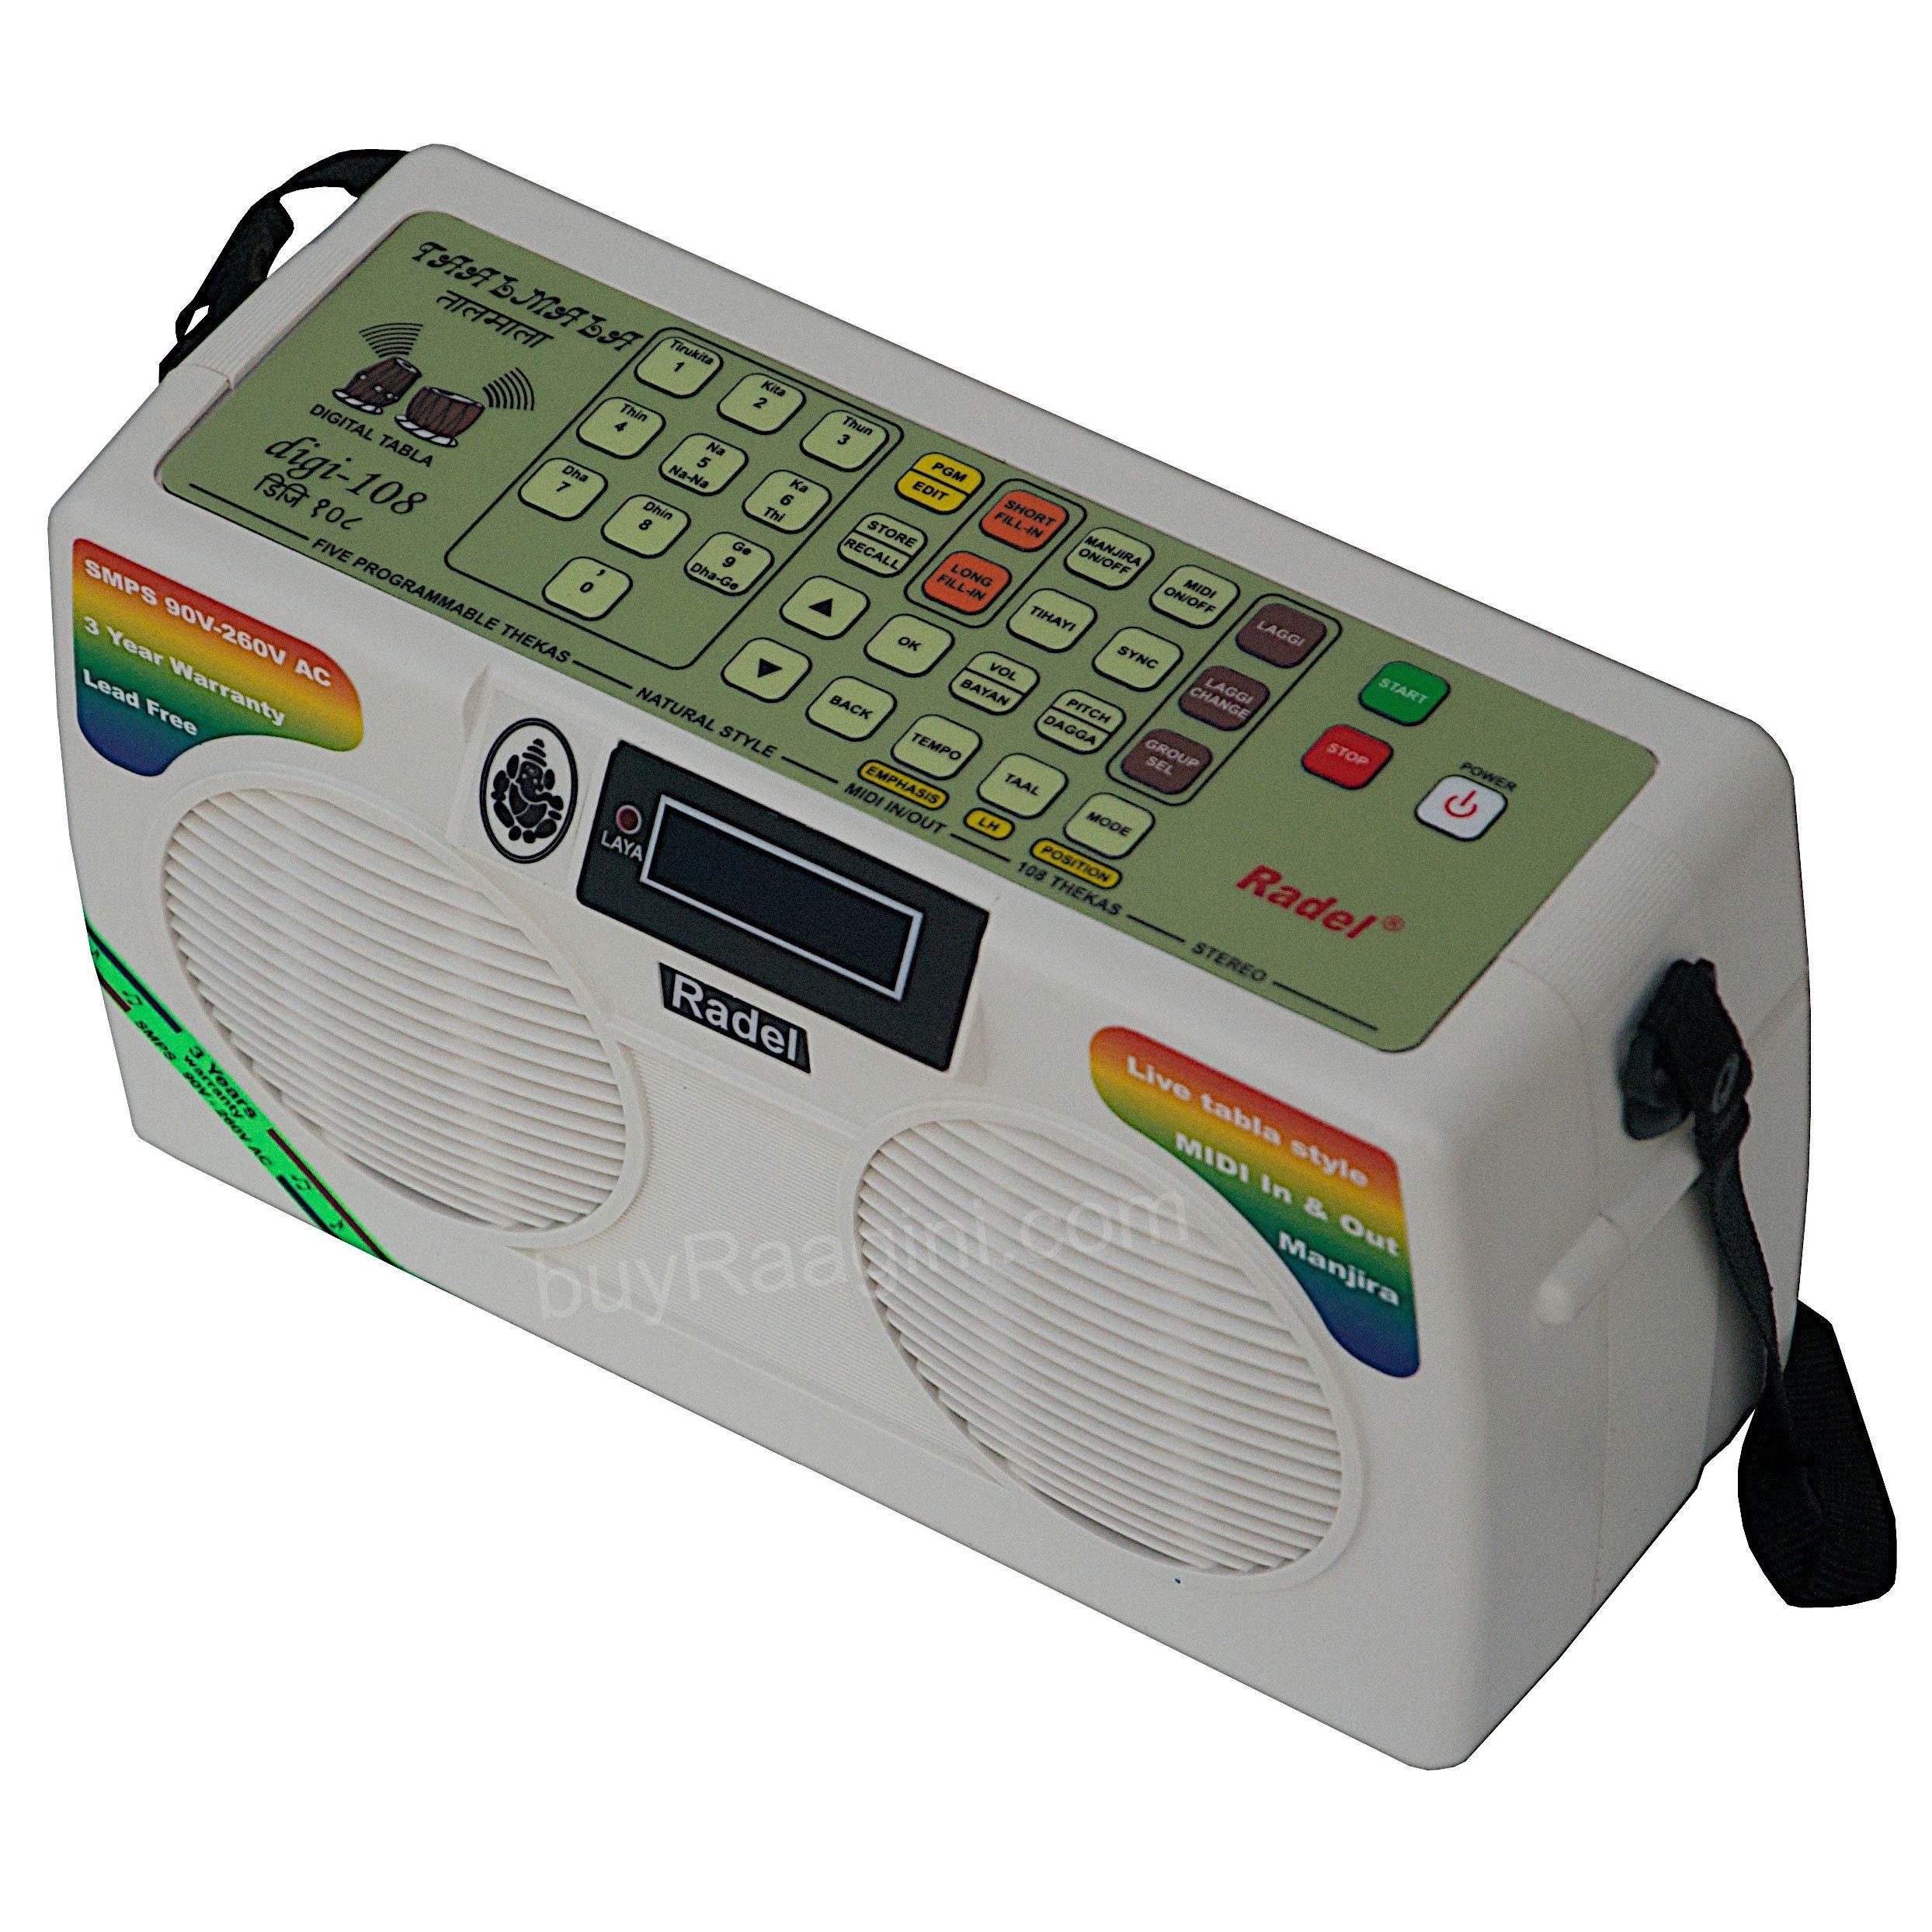 Electronic Tabla - RADEL Taalmala - Digi 108, Electronic Tabla & Manjira - Tabla Sampler, DJ Tabla Sound Machine, Instruction Manual, Power Cord, Bag (US-PDI-AAF) by Radel at buyRaagini.com (Image #4)